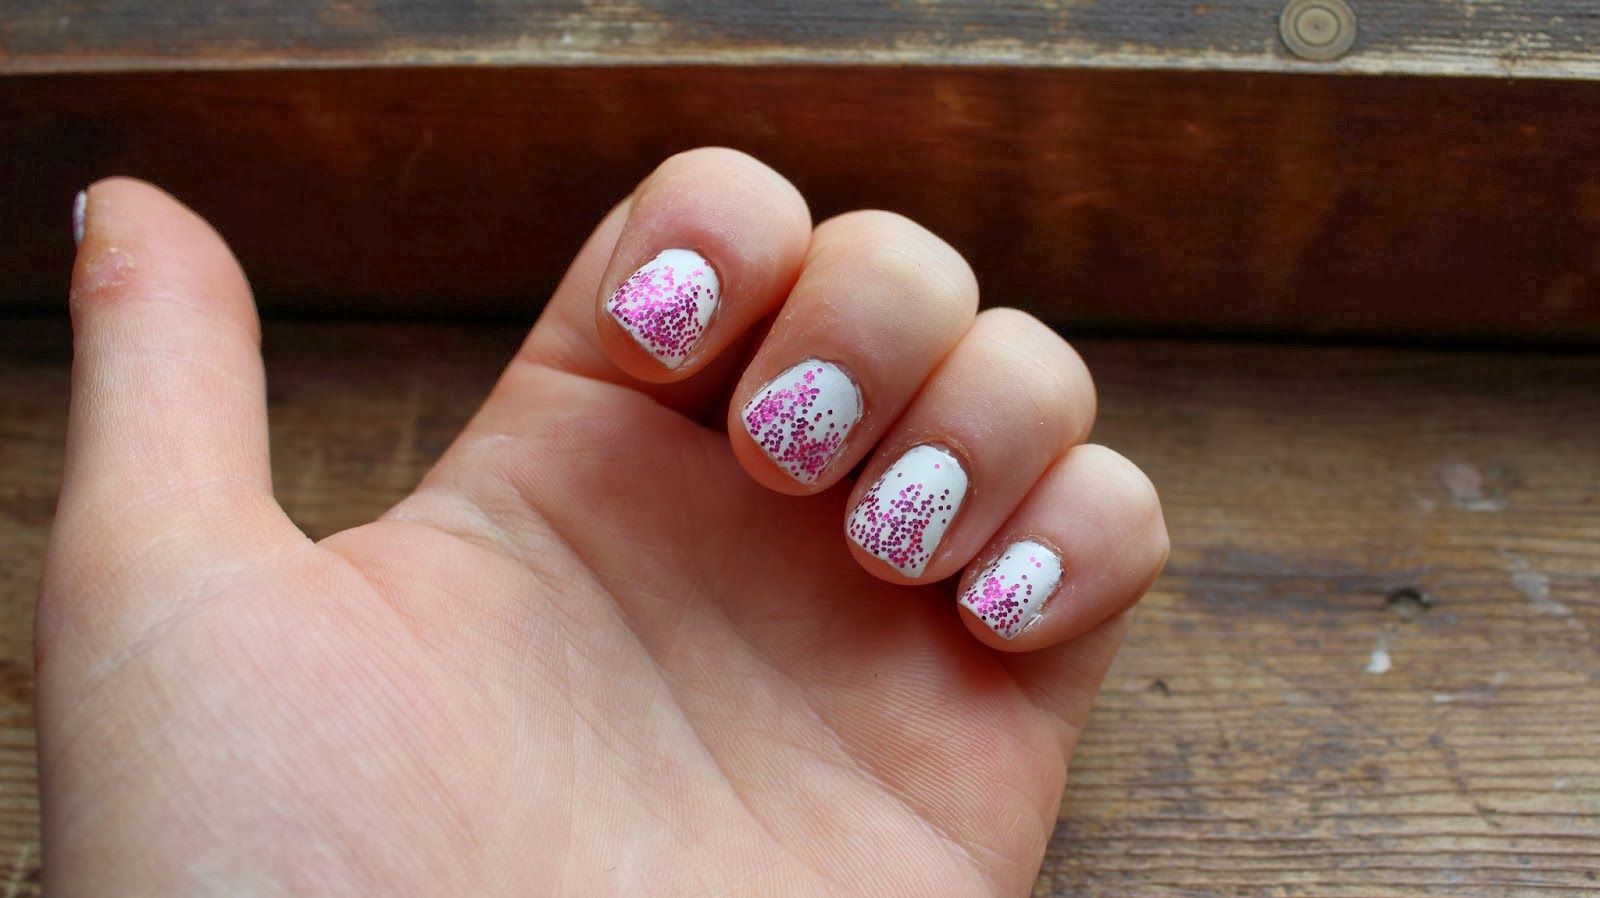 Mind Body Beauty: My Favorite Glitter Nail Polishes